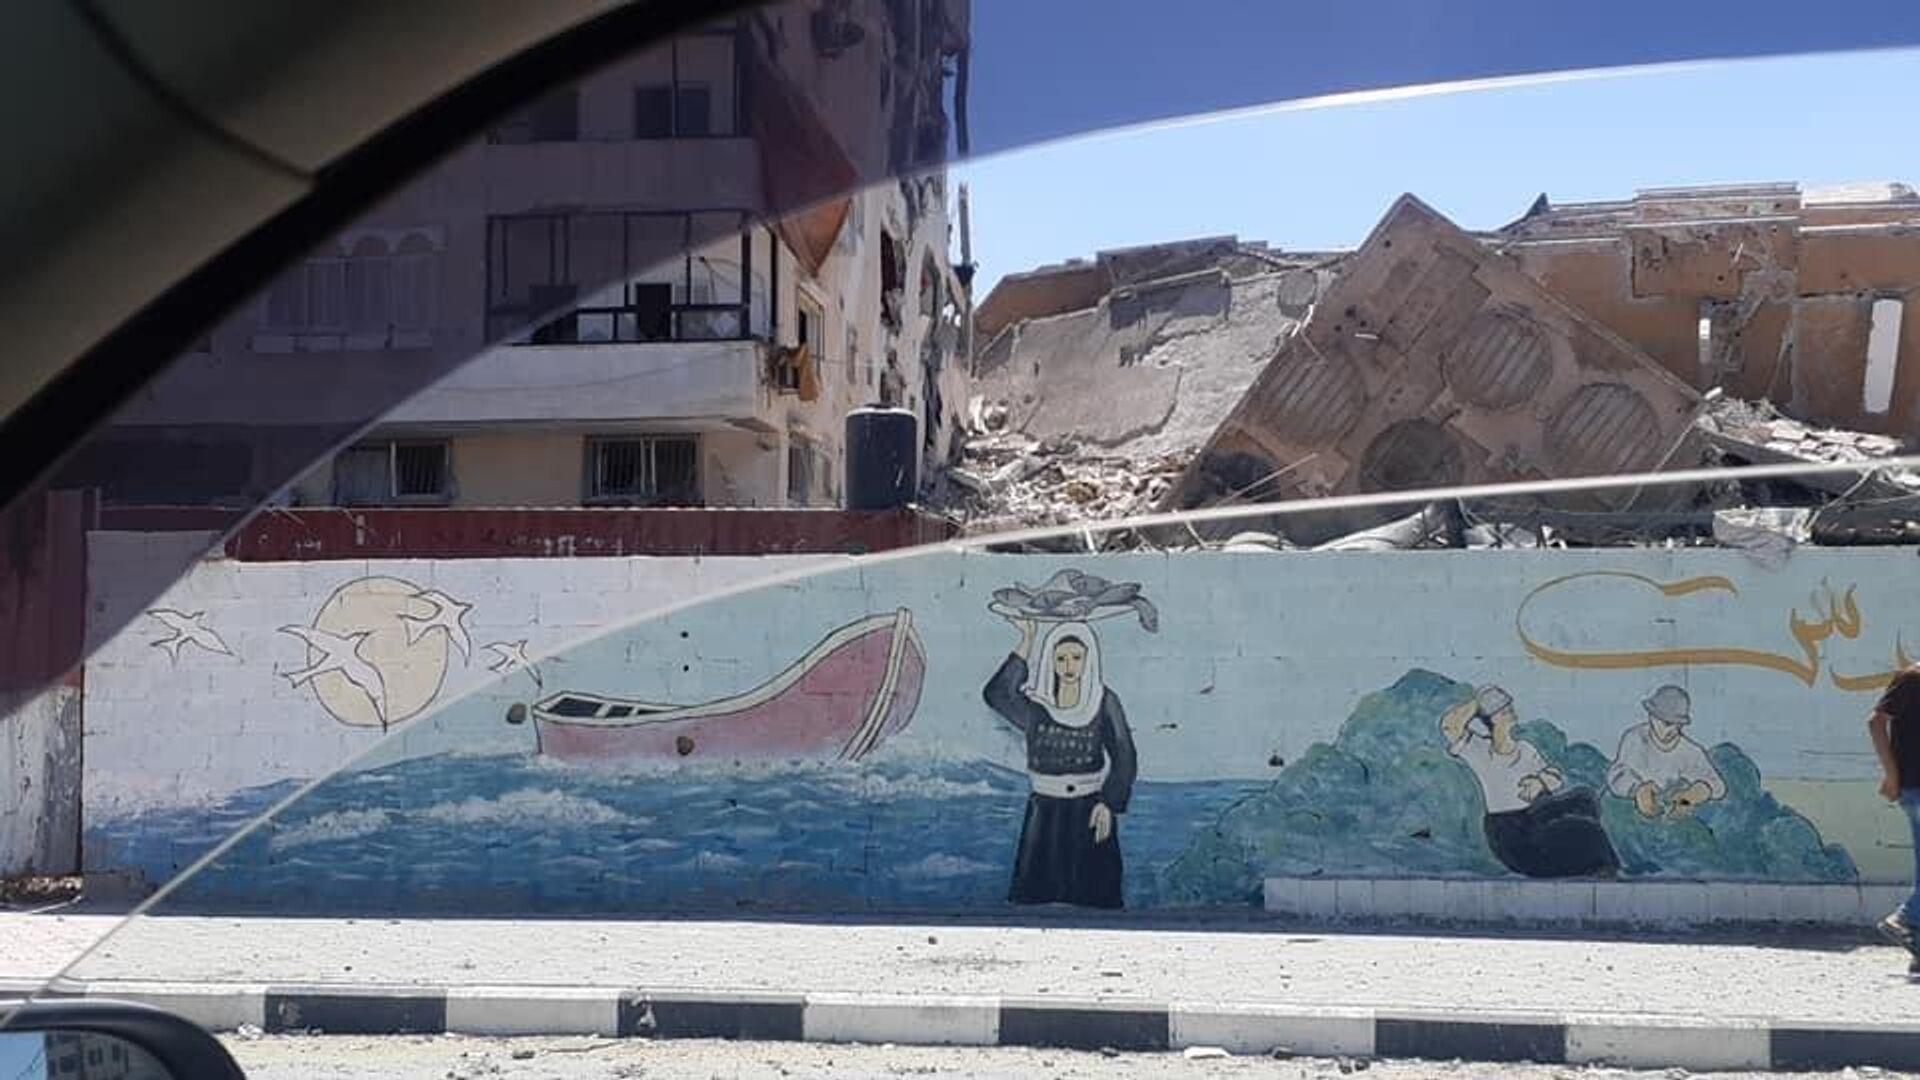 Una situazione drammatica a Gaza dopo una nuova escalation di violenza tra israeliani e palestinesi - Sputnik Italia, 1920, 21.05.2021